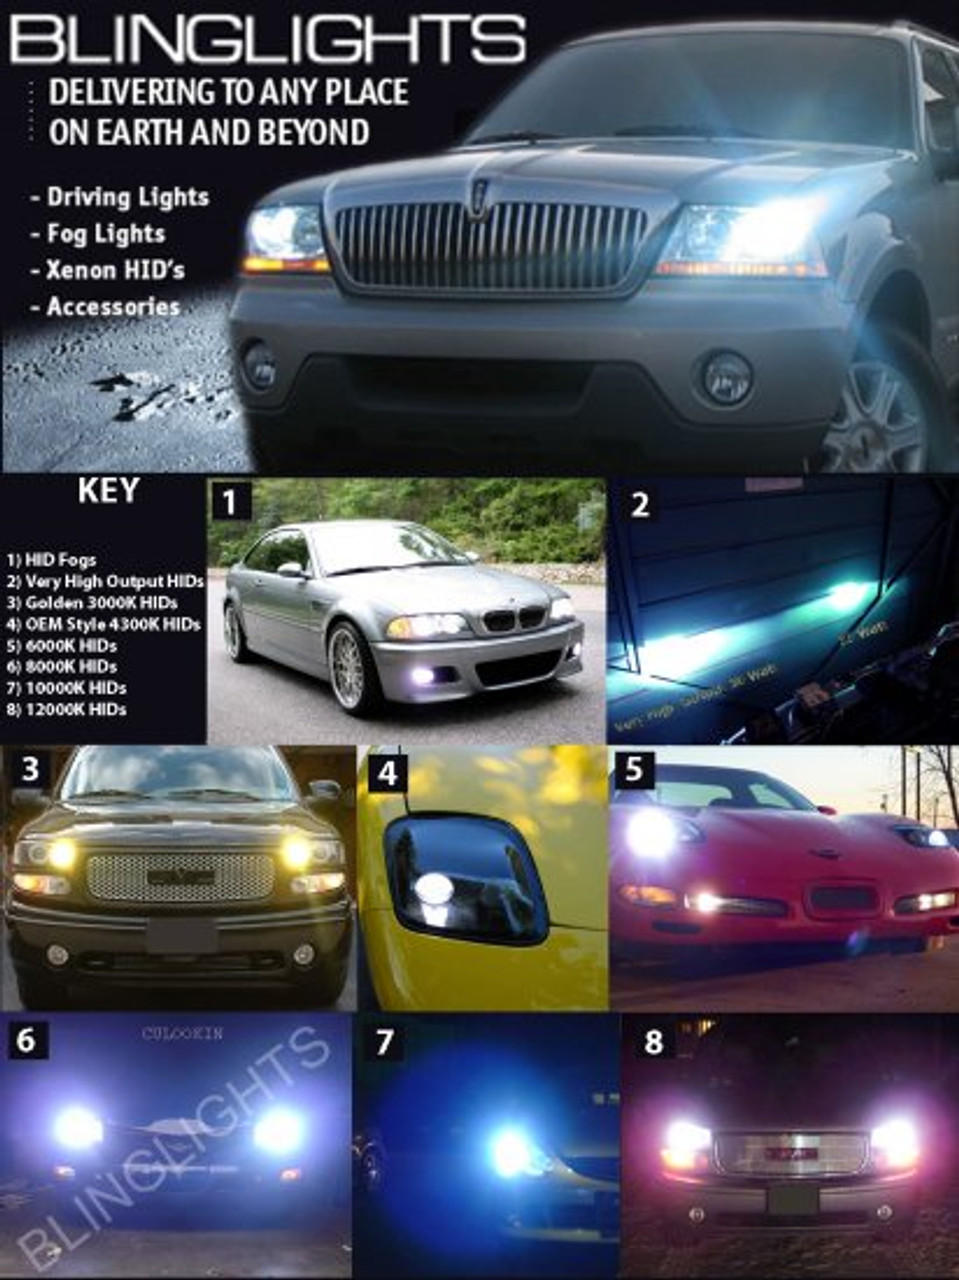 2000 2001 2002 2003 Nissan Maxima Xenon 55 Watt HID Headlamps Headlights Conversion Kit